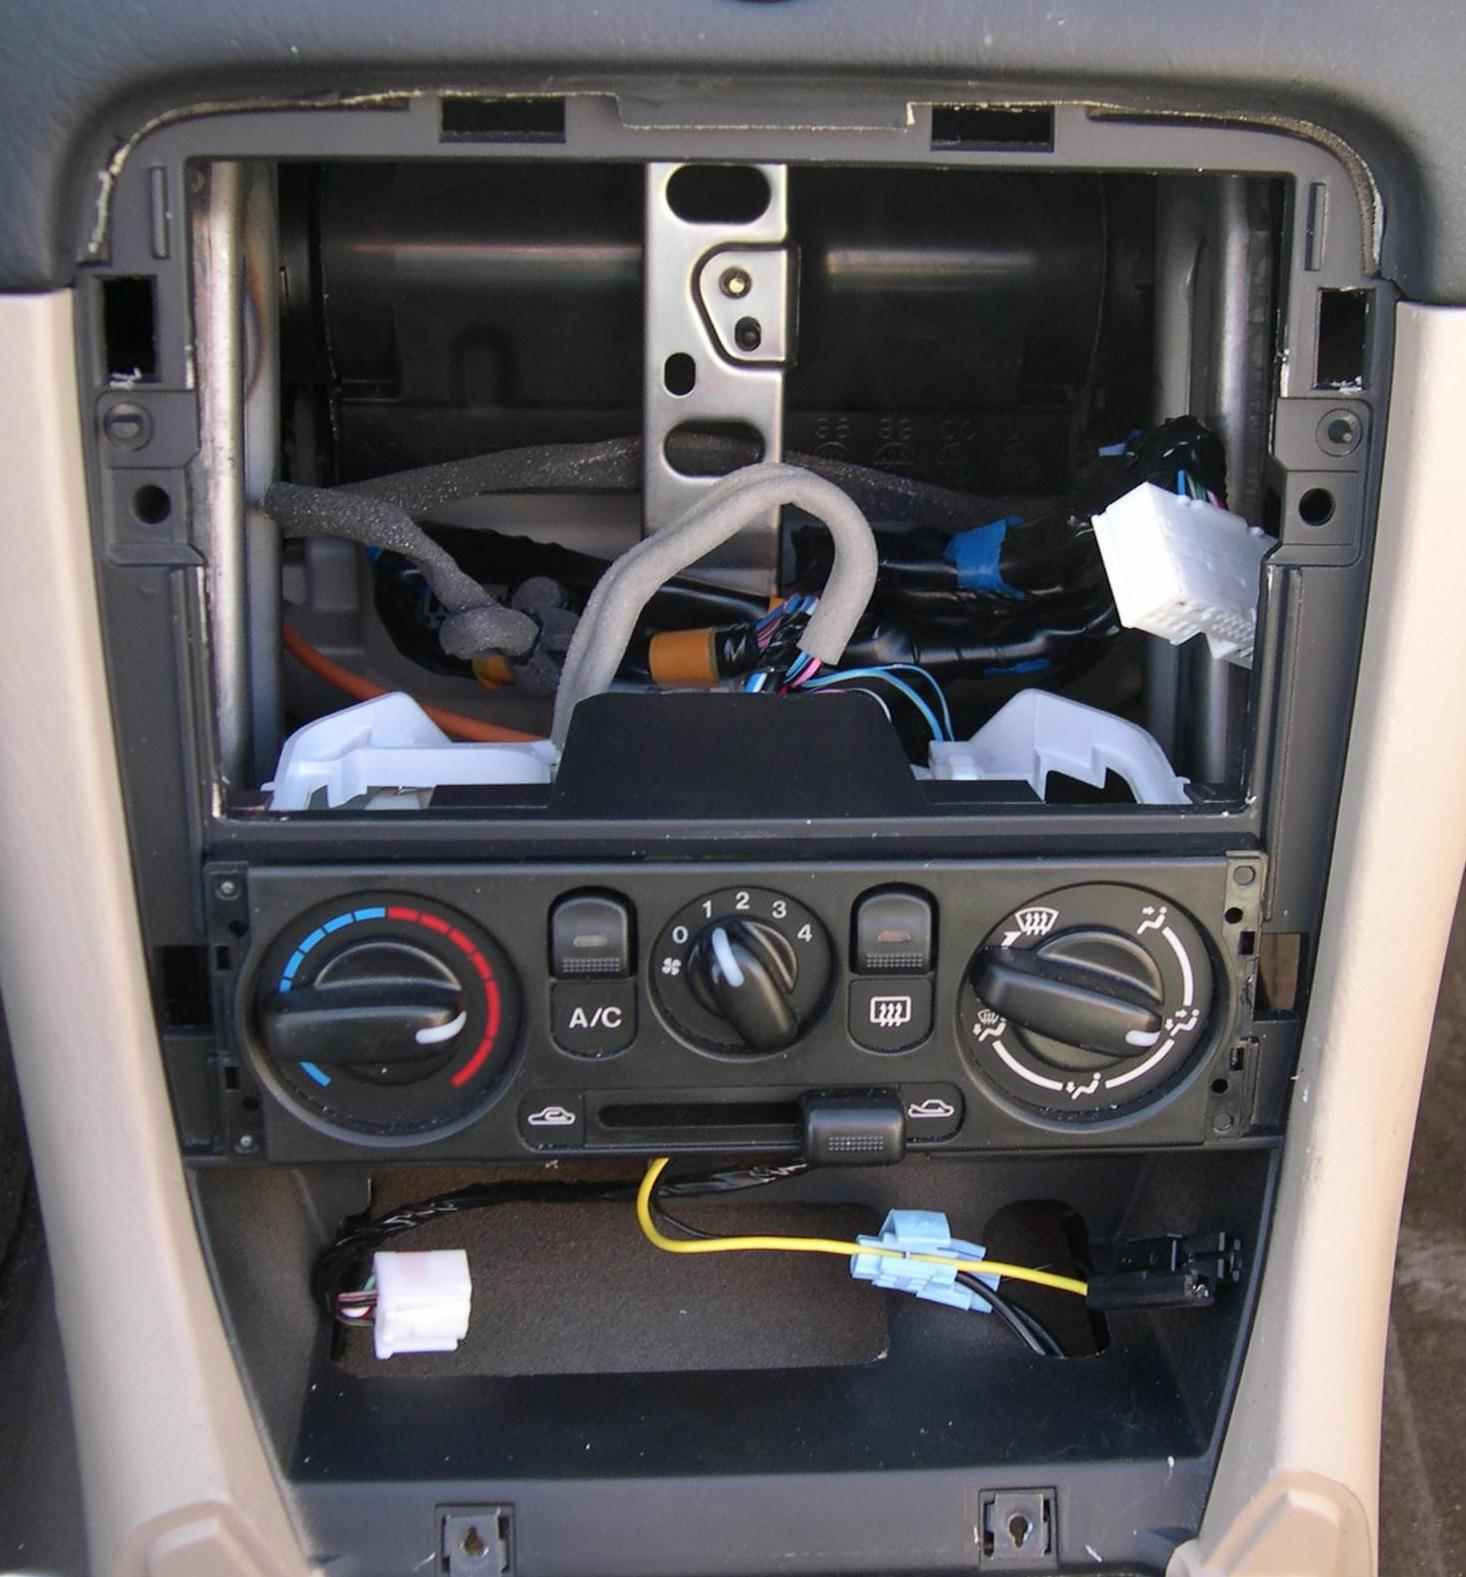 renault megane window motor wiring diagram garage sub panel the mazda nb oem audio system faq 2001 radio out photo stephen foskett